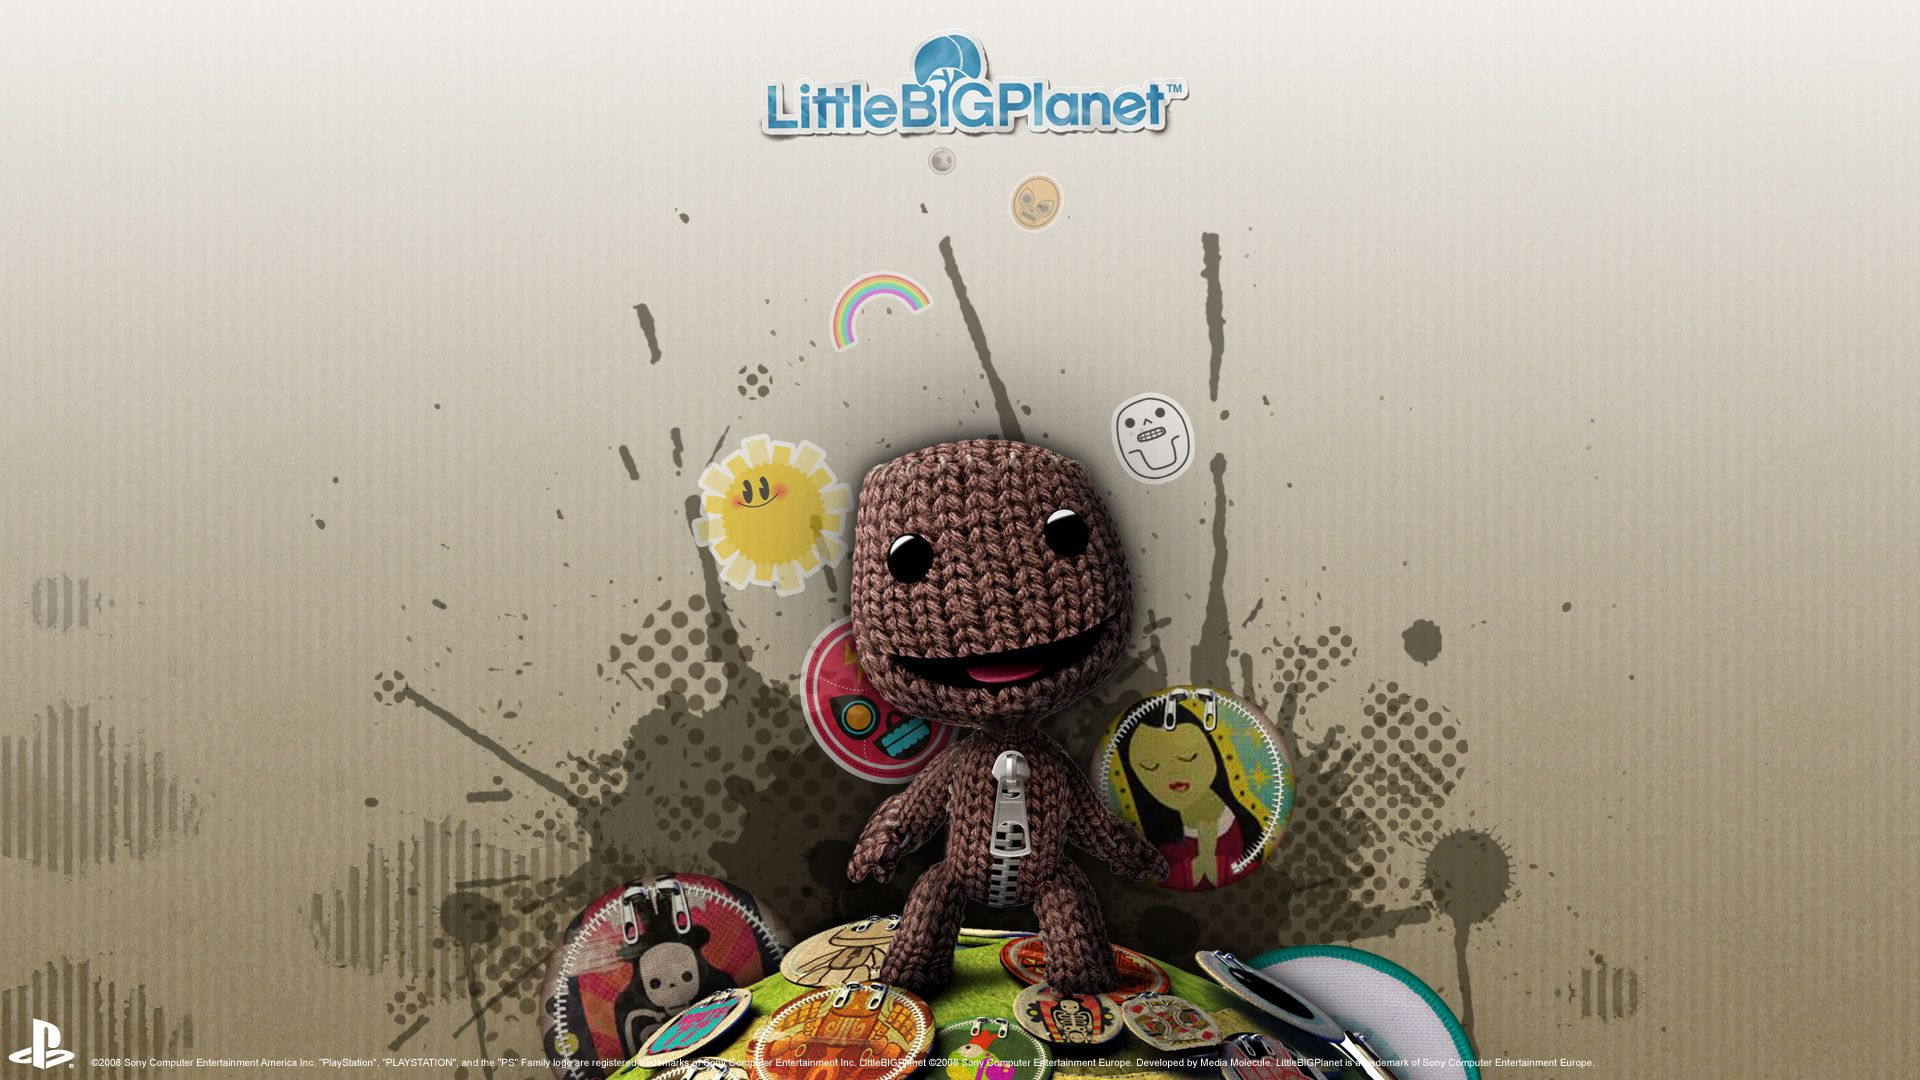 hd little big planet wallpapers